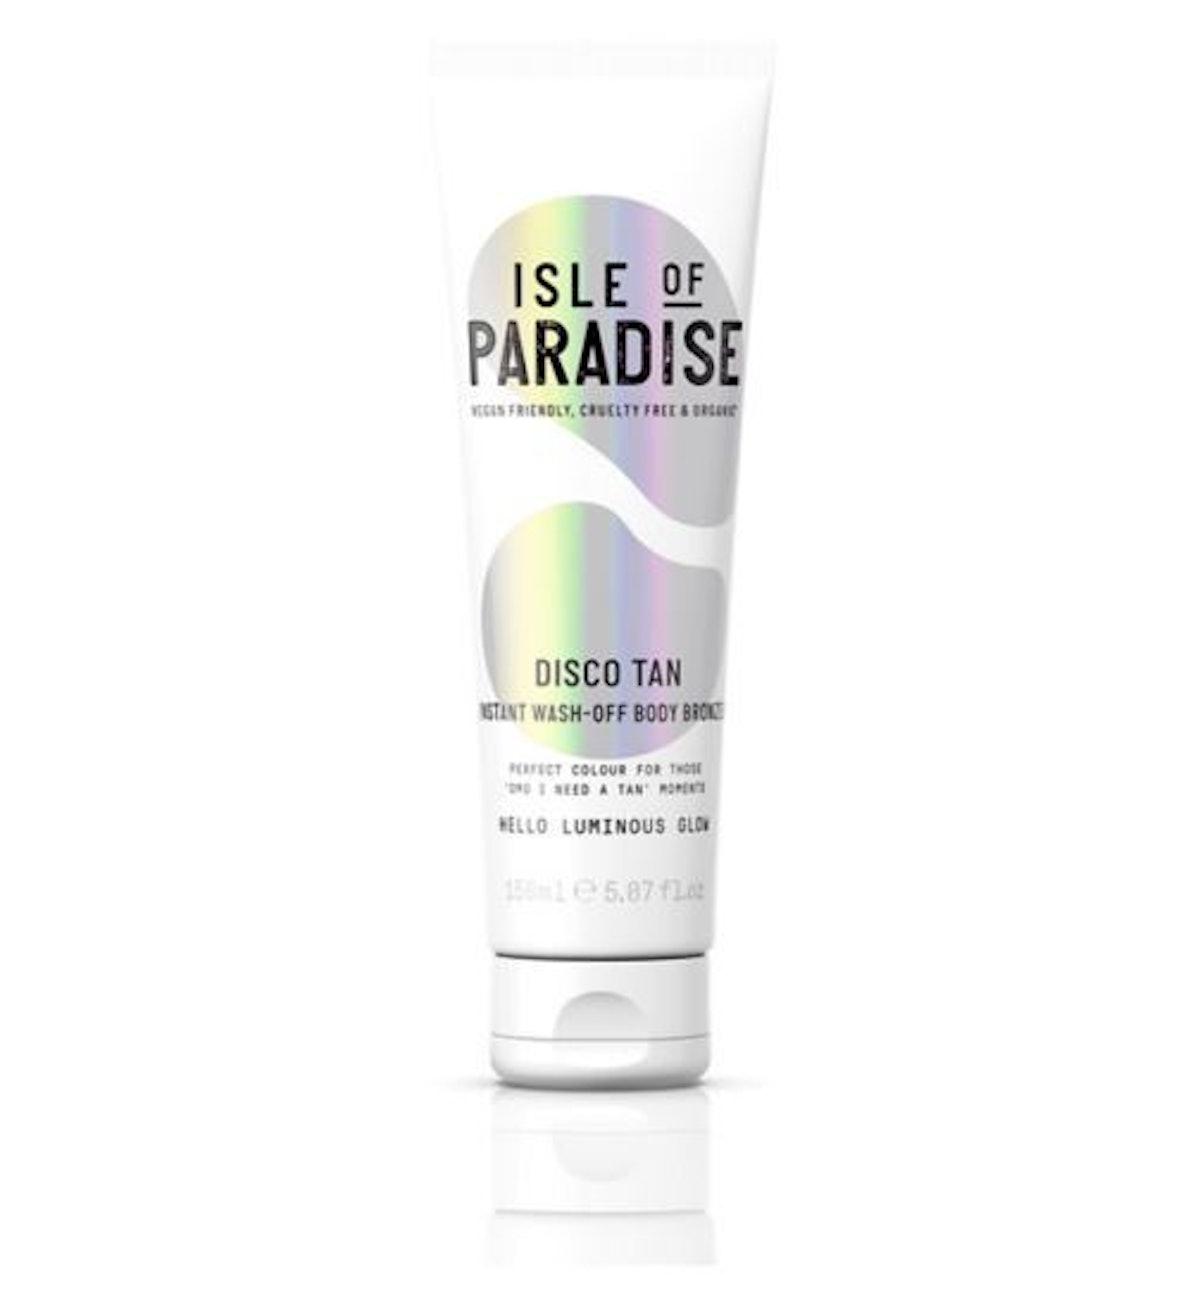 Isle of Paradise Disco Tan